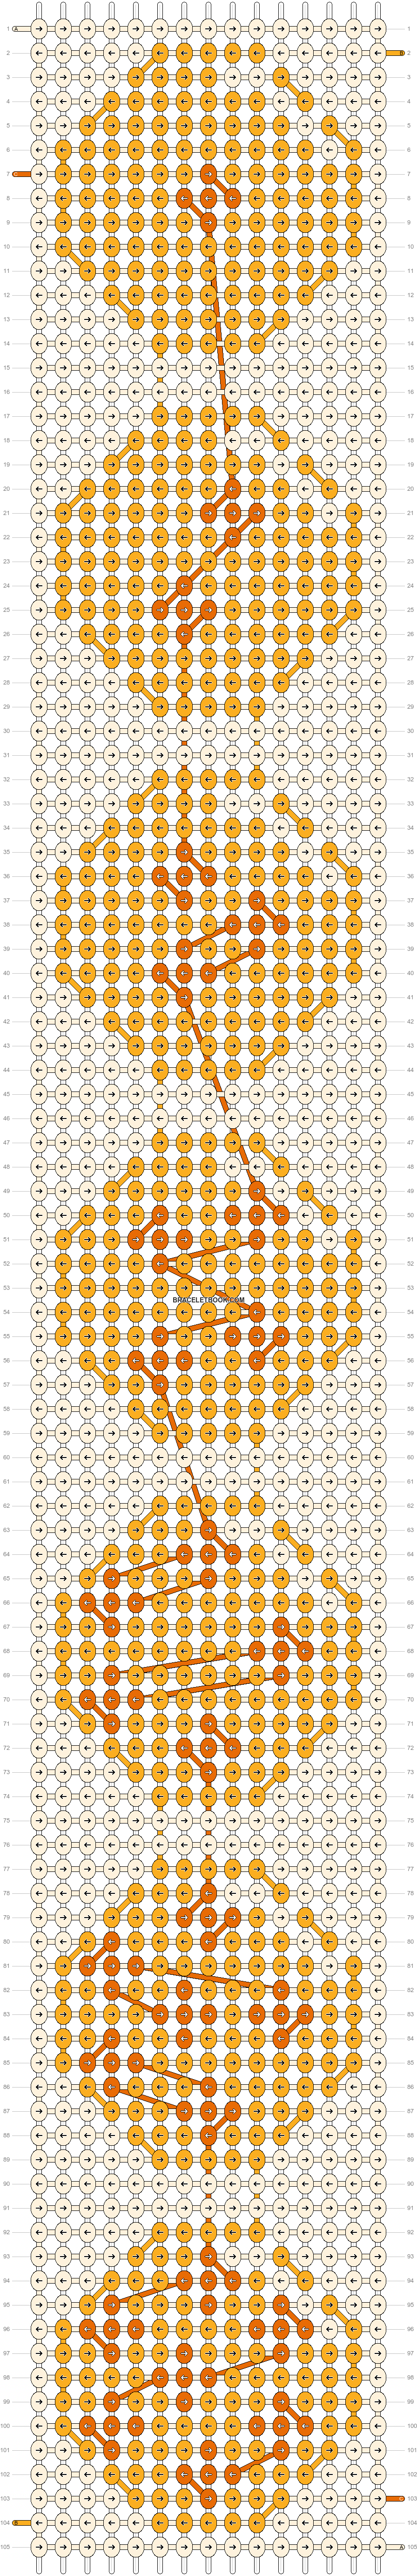 Alpha pattern #13285 pattern